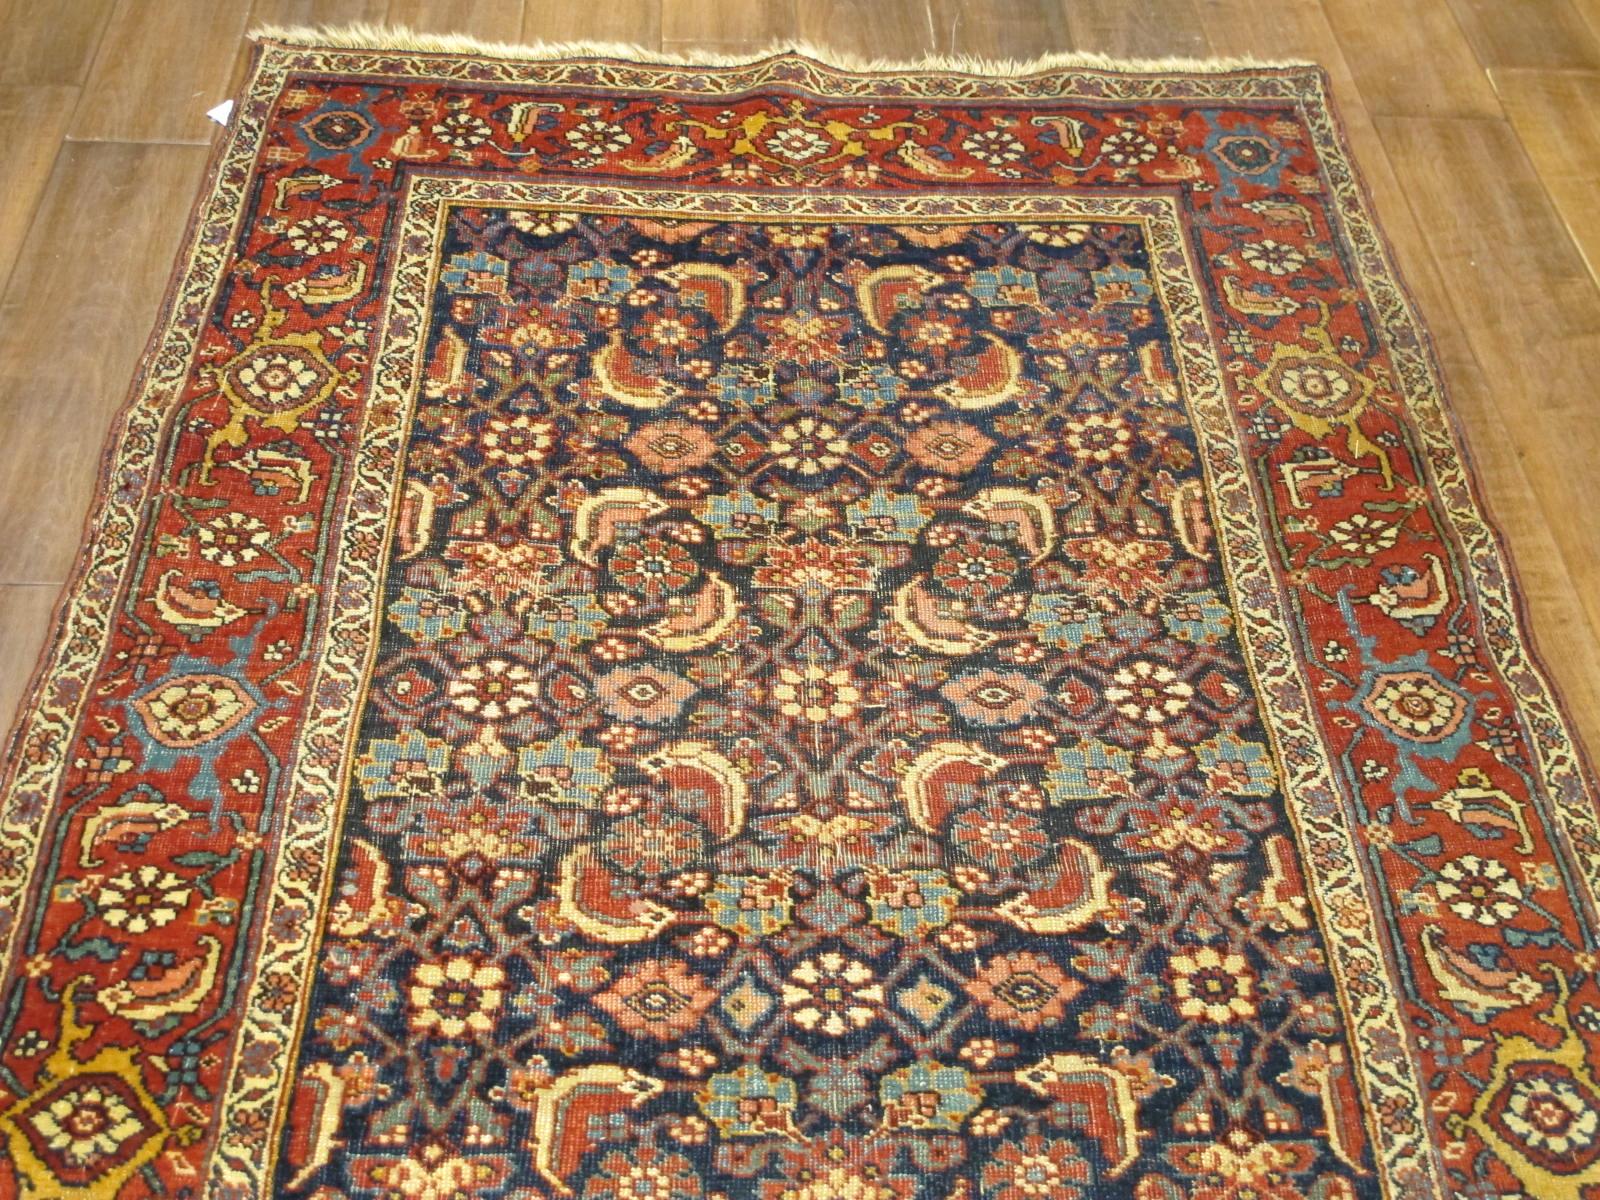 13078 antique persian bidjar runner 3,6x13,4 (4)